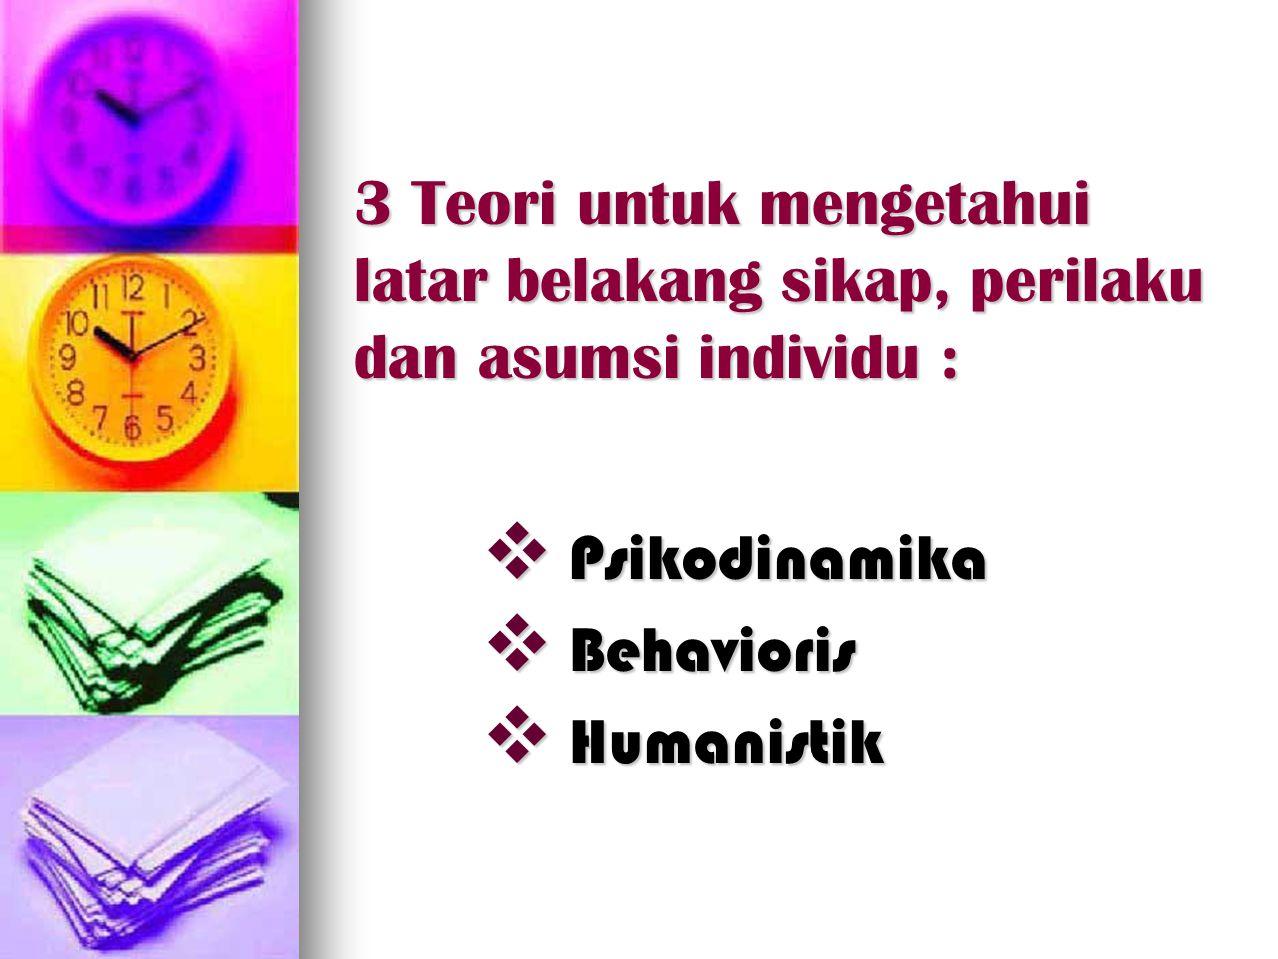 3 Teori untuk mengetahui latar belakang sikap, perilaku dan asumsi individu :